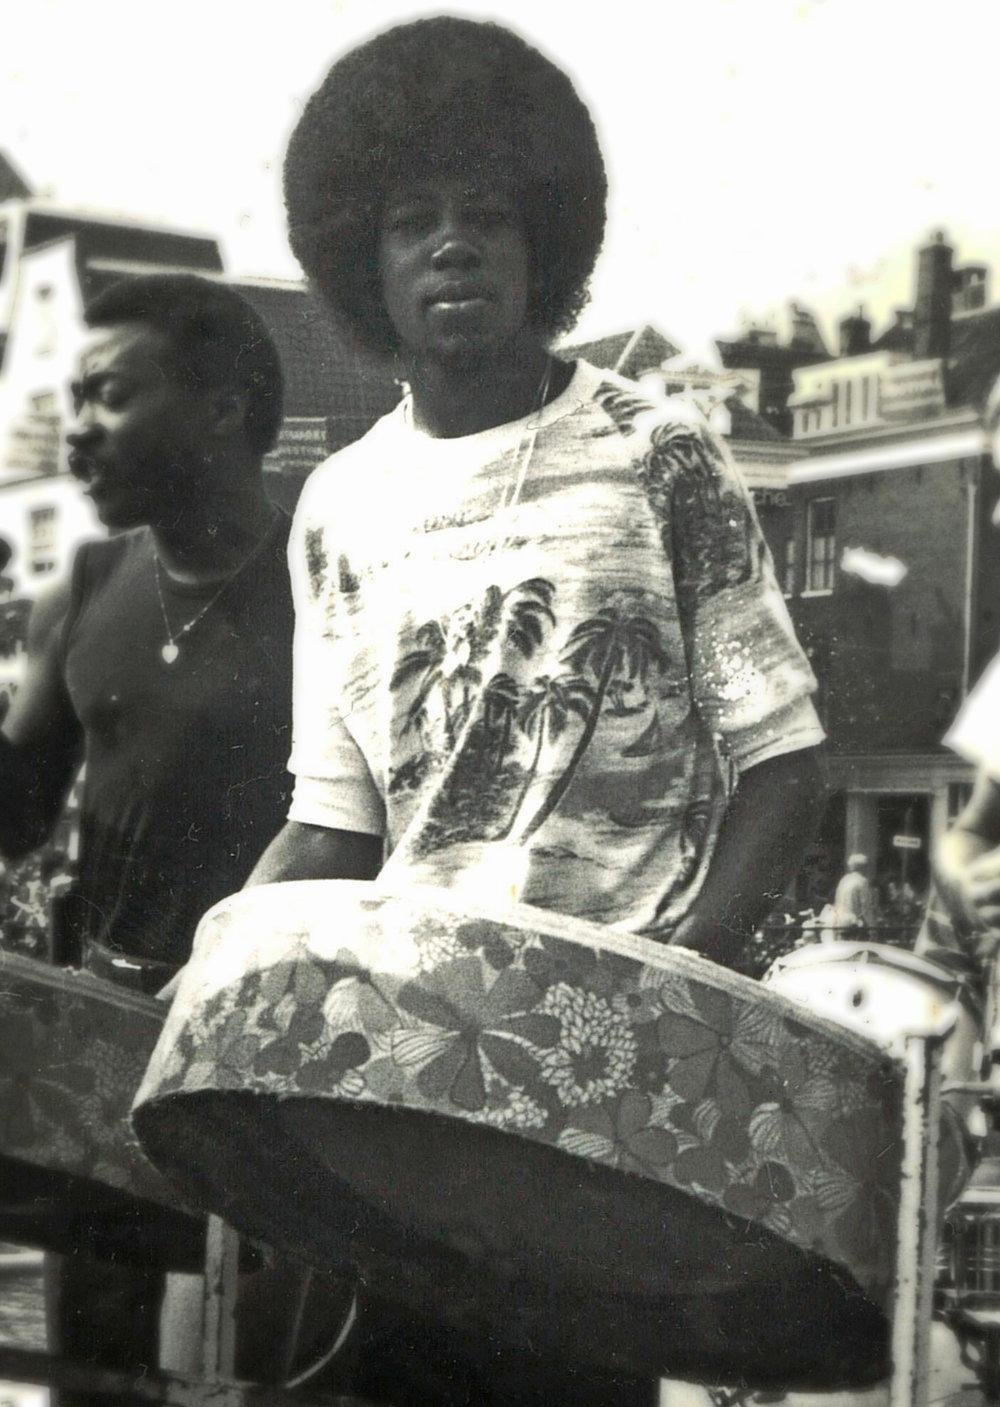 Lesley Joseph, (steelpan) early 80's